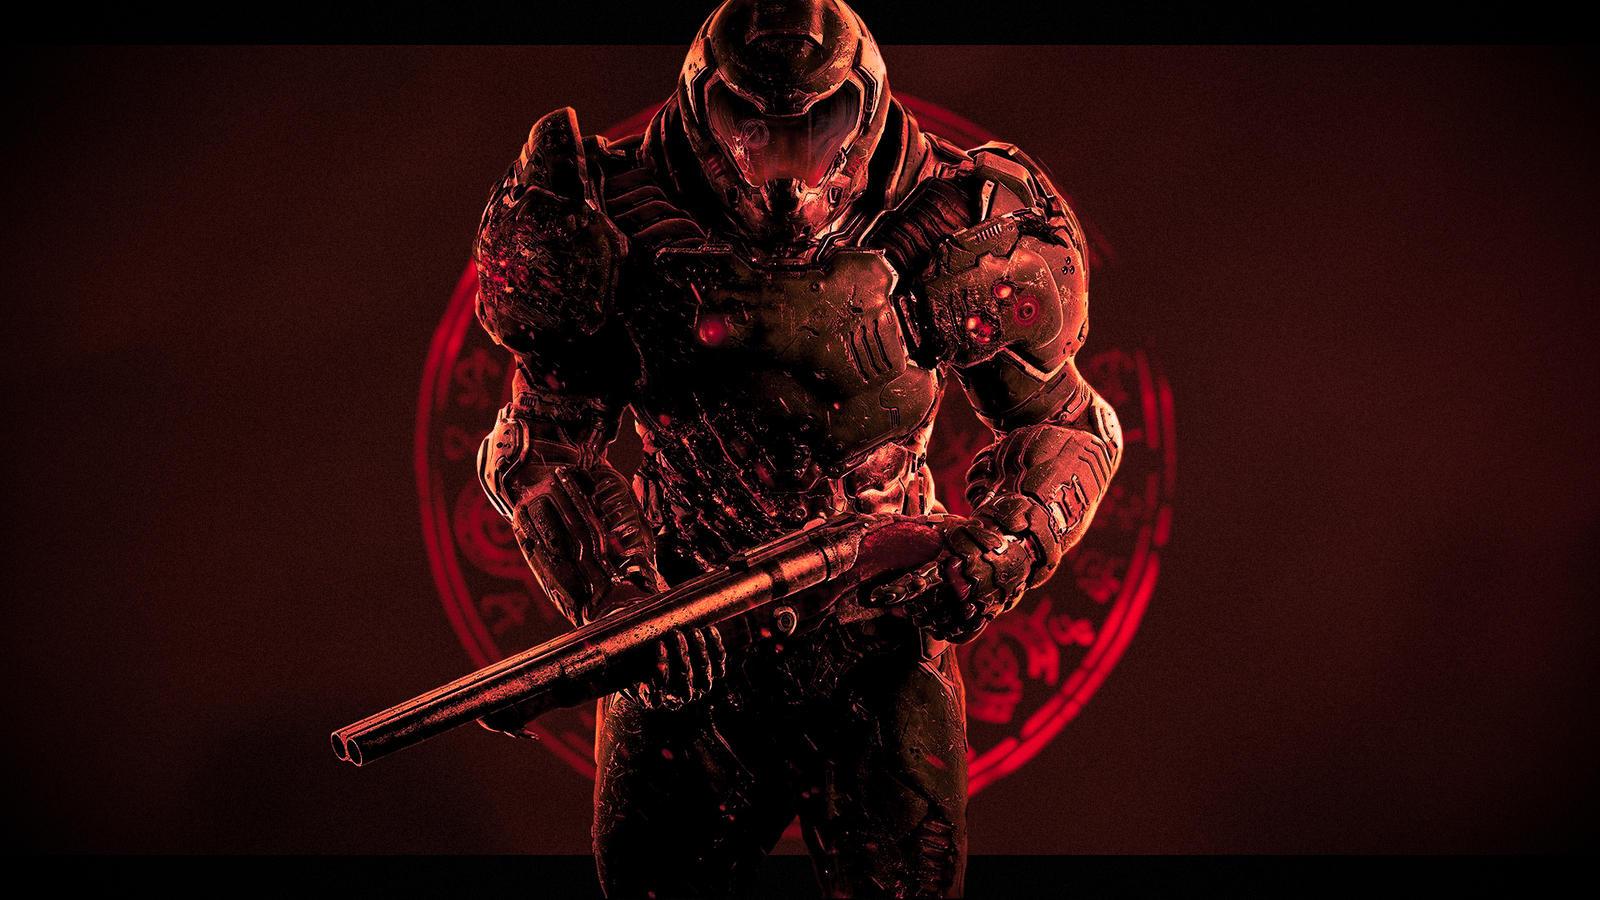 Doom Slayer 1080p By Markthepotato On Deviantart